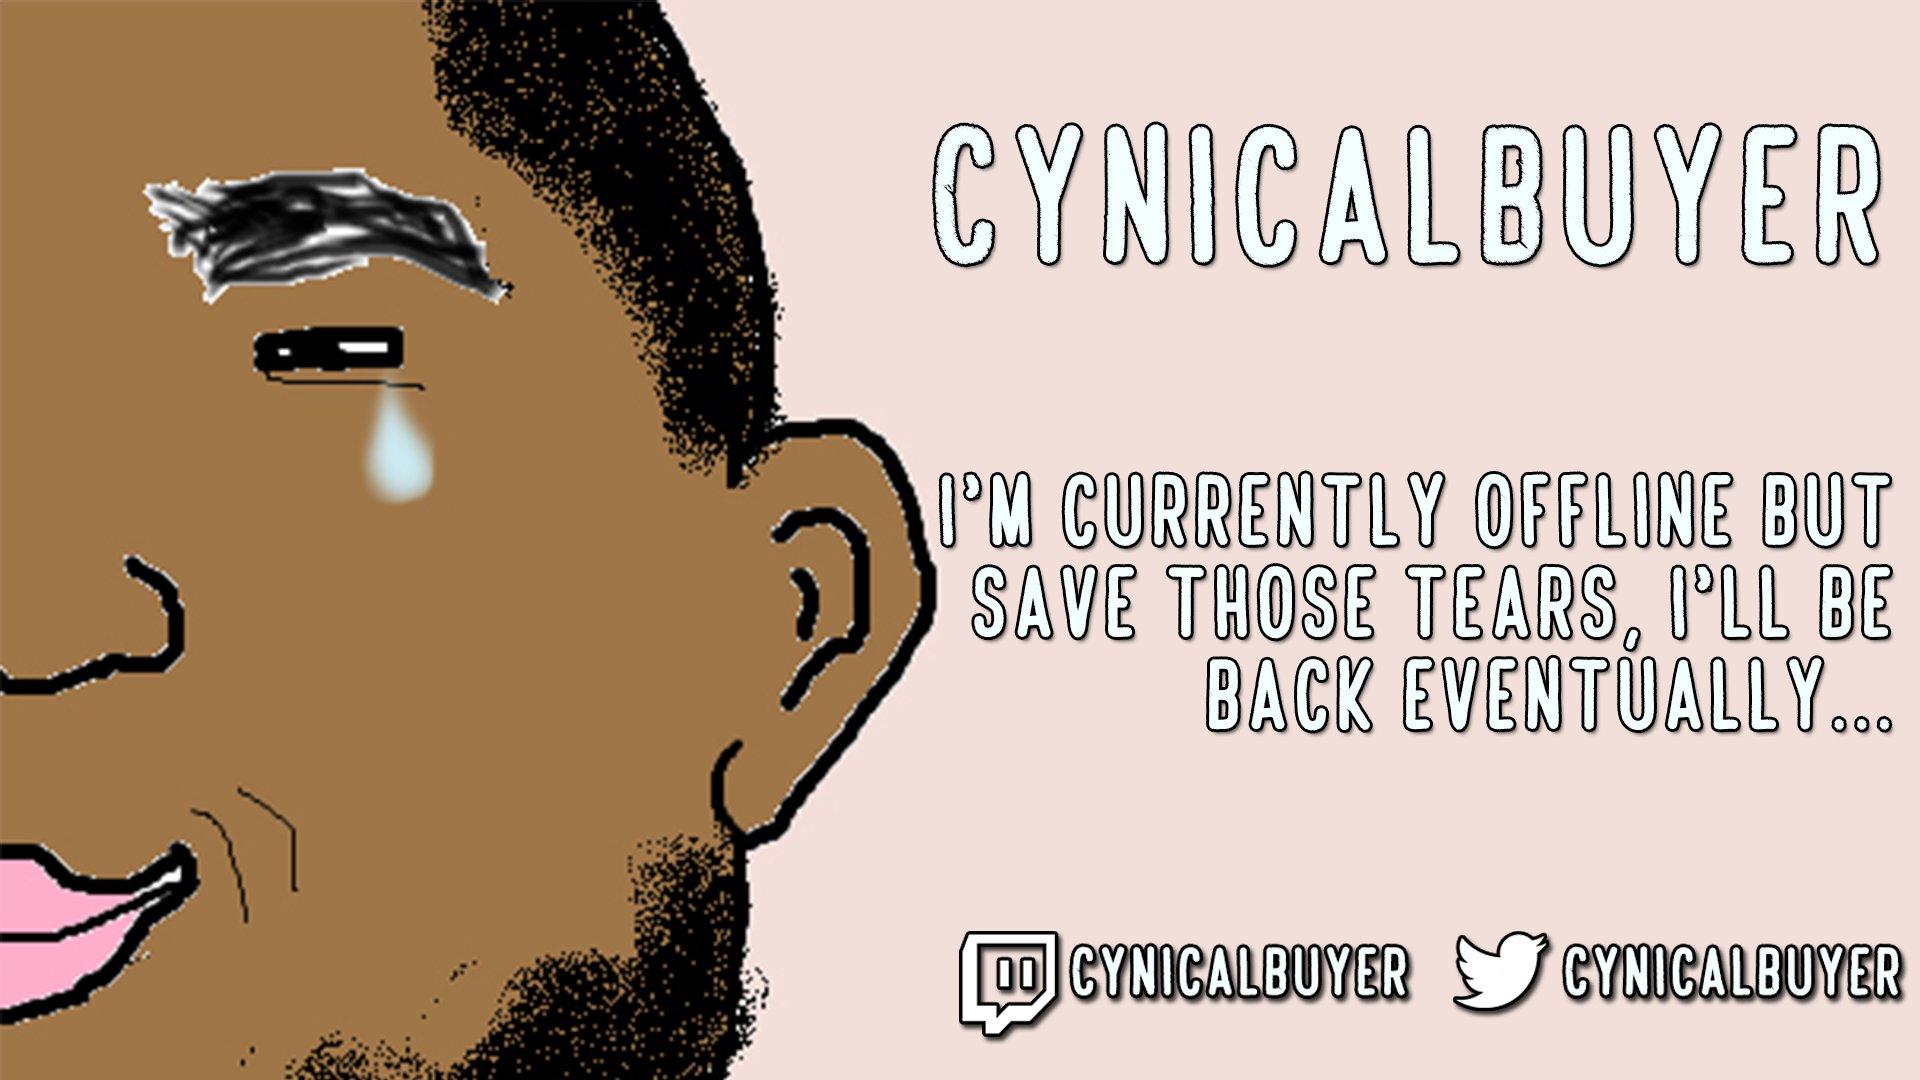 Twitch stream of CynicalBuyer